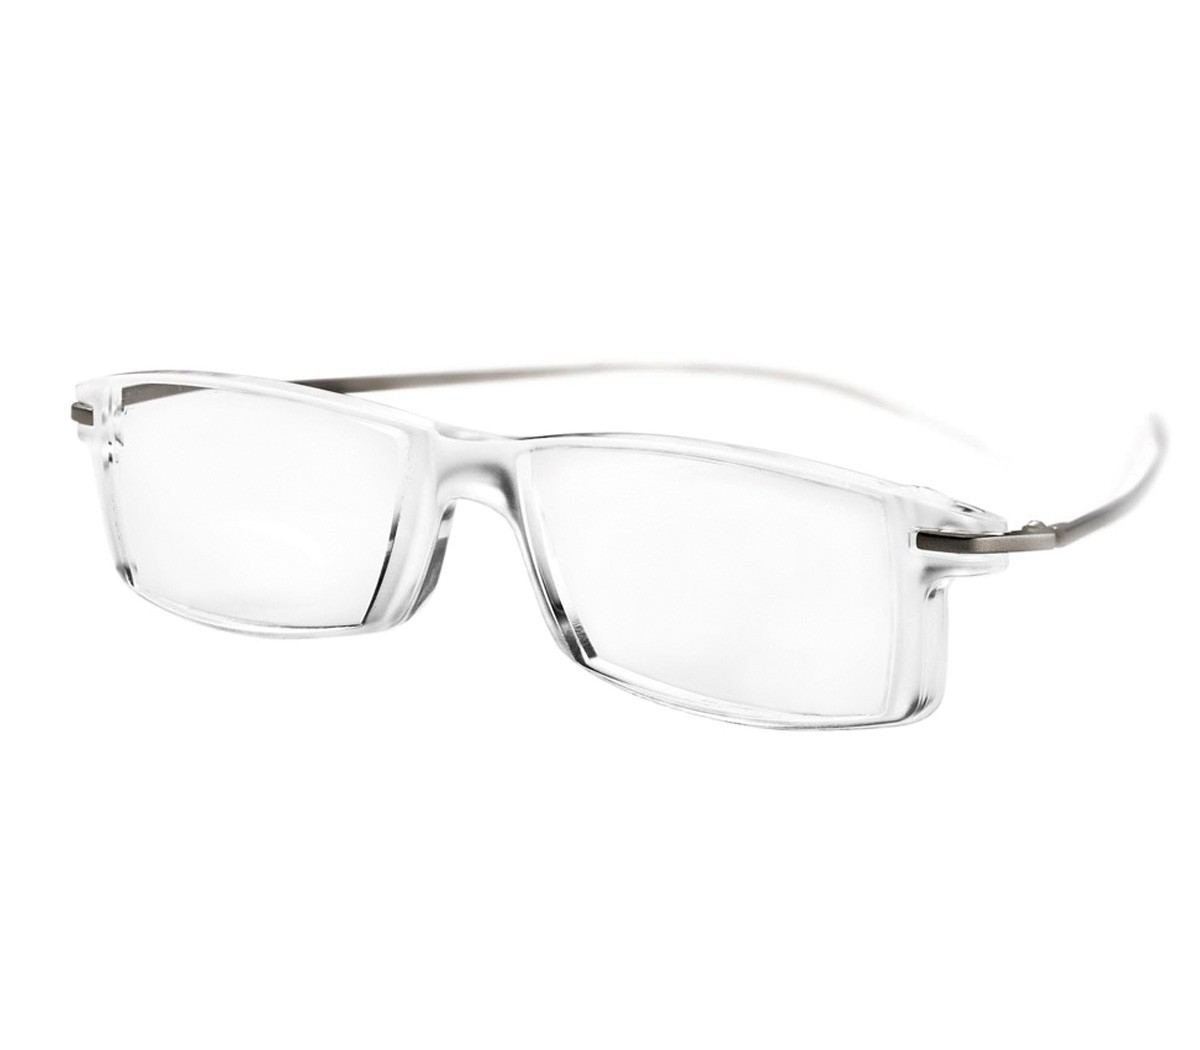 Leesbril Multifocaal MiniFrame 29050 transparant/gun